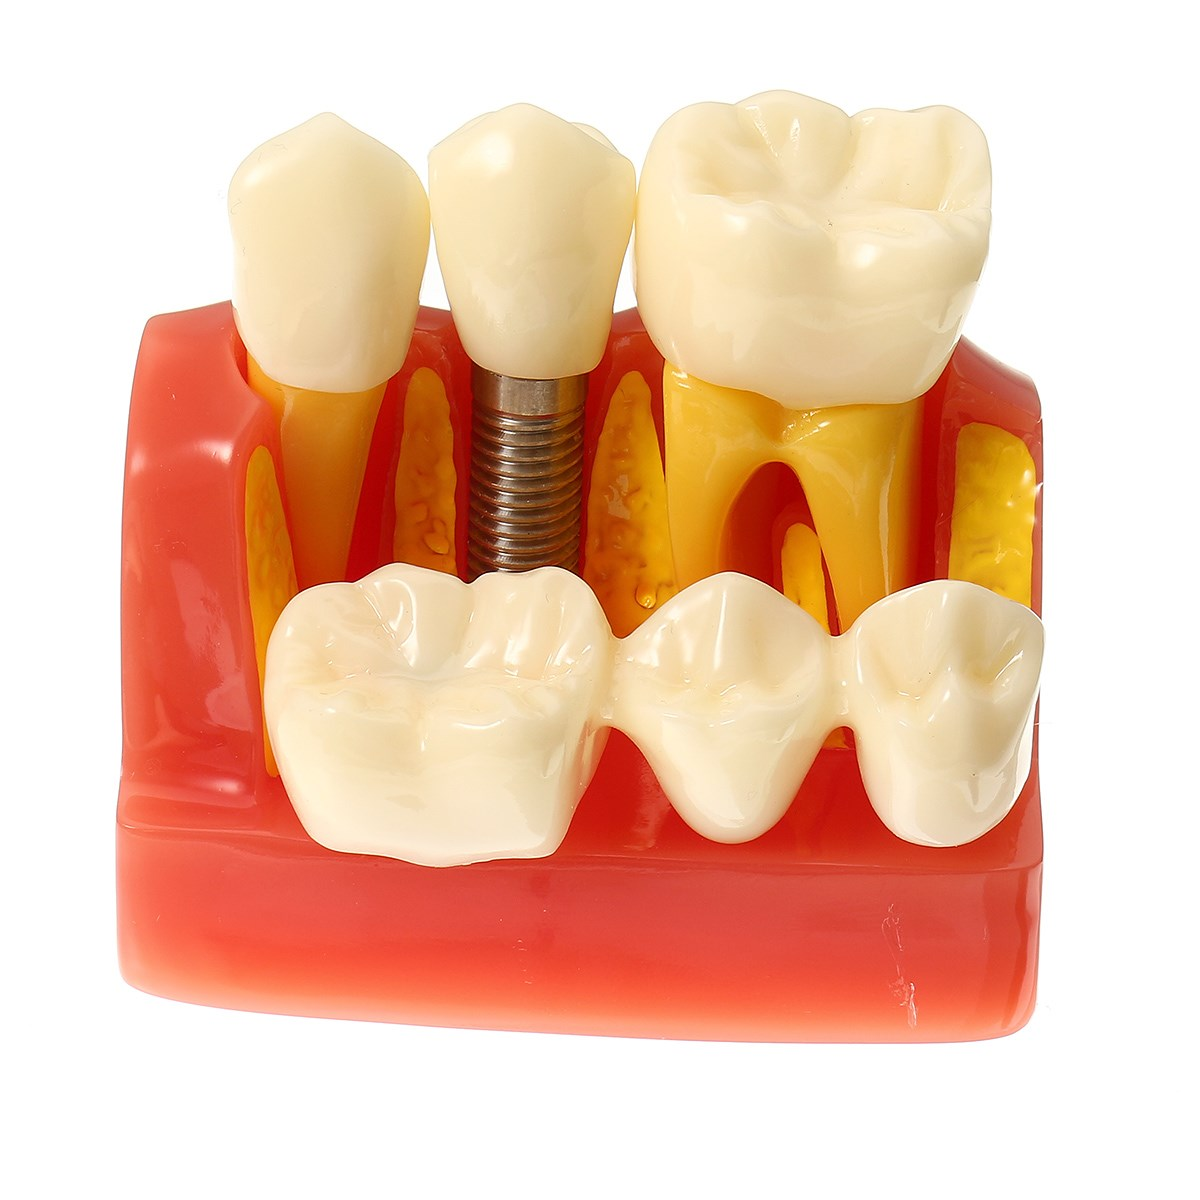 New 4 Times Dental Implant Disease Teeth Model With Restoration Bridge Crown For Medical Science Teaching Demonstration 2017 New soarday dental endodontic restoration model teaching communication model pathological display dental caries